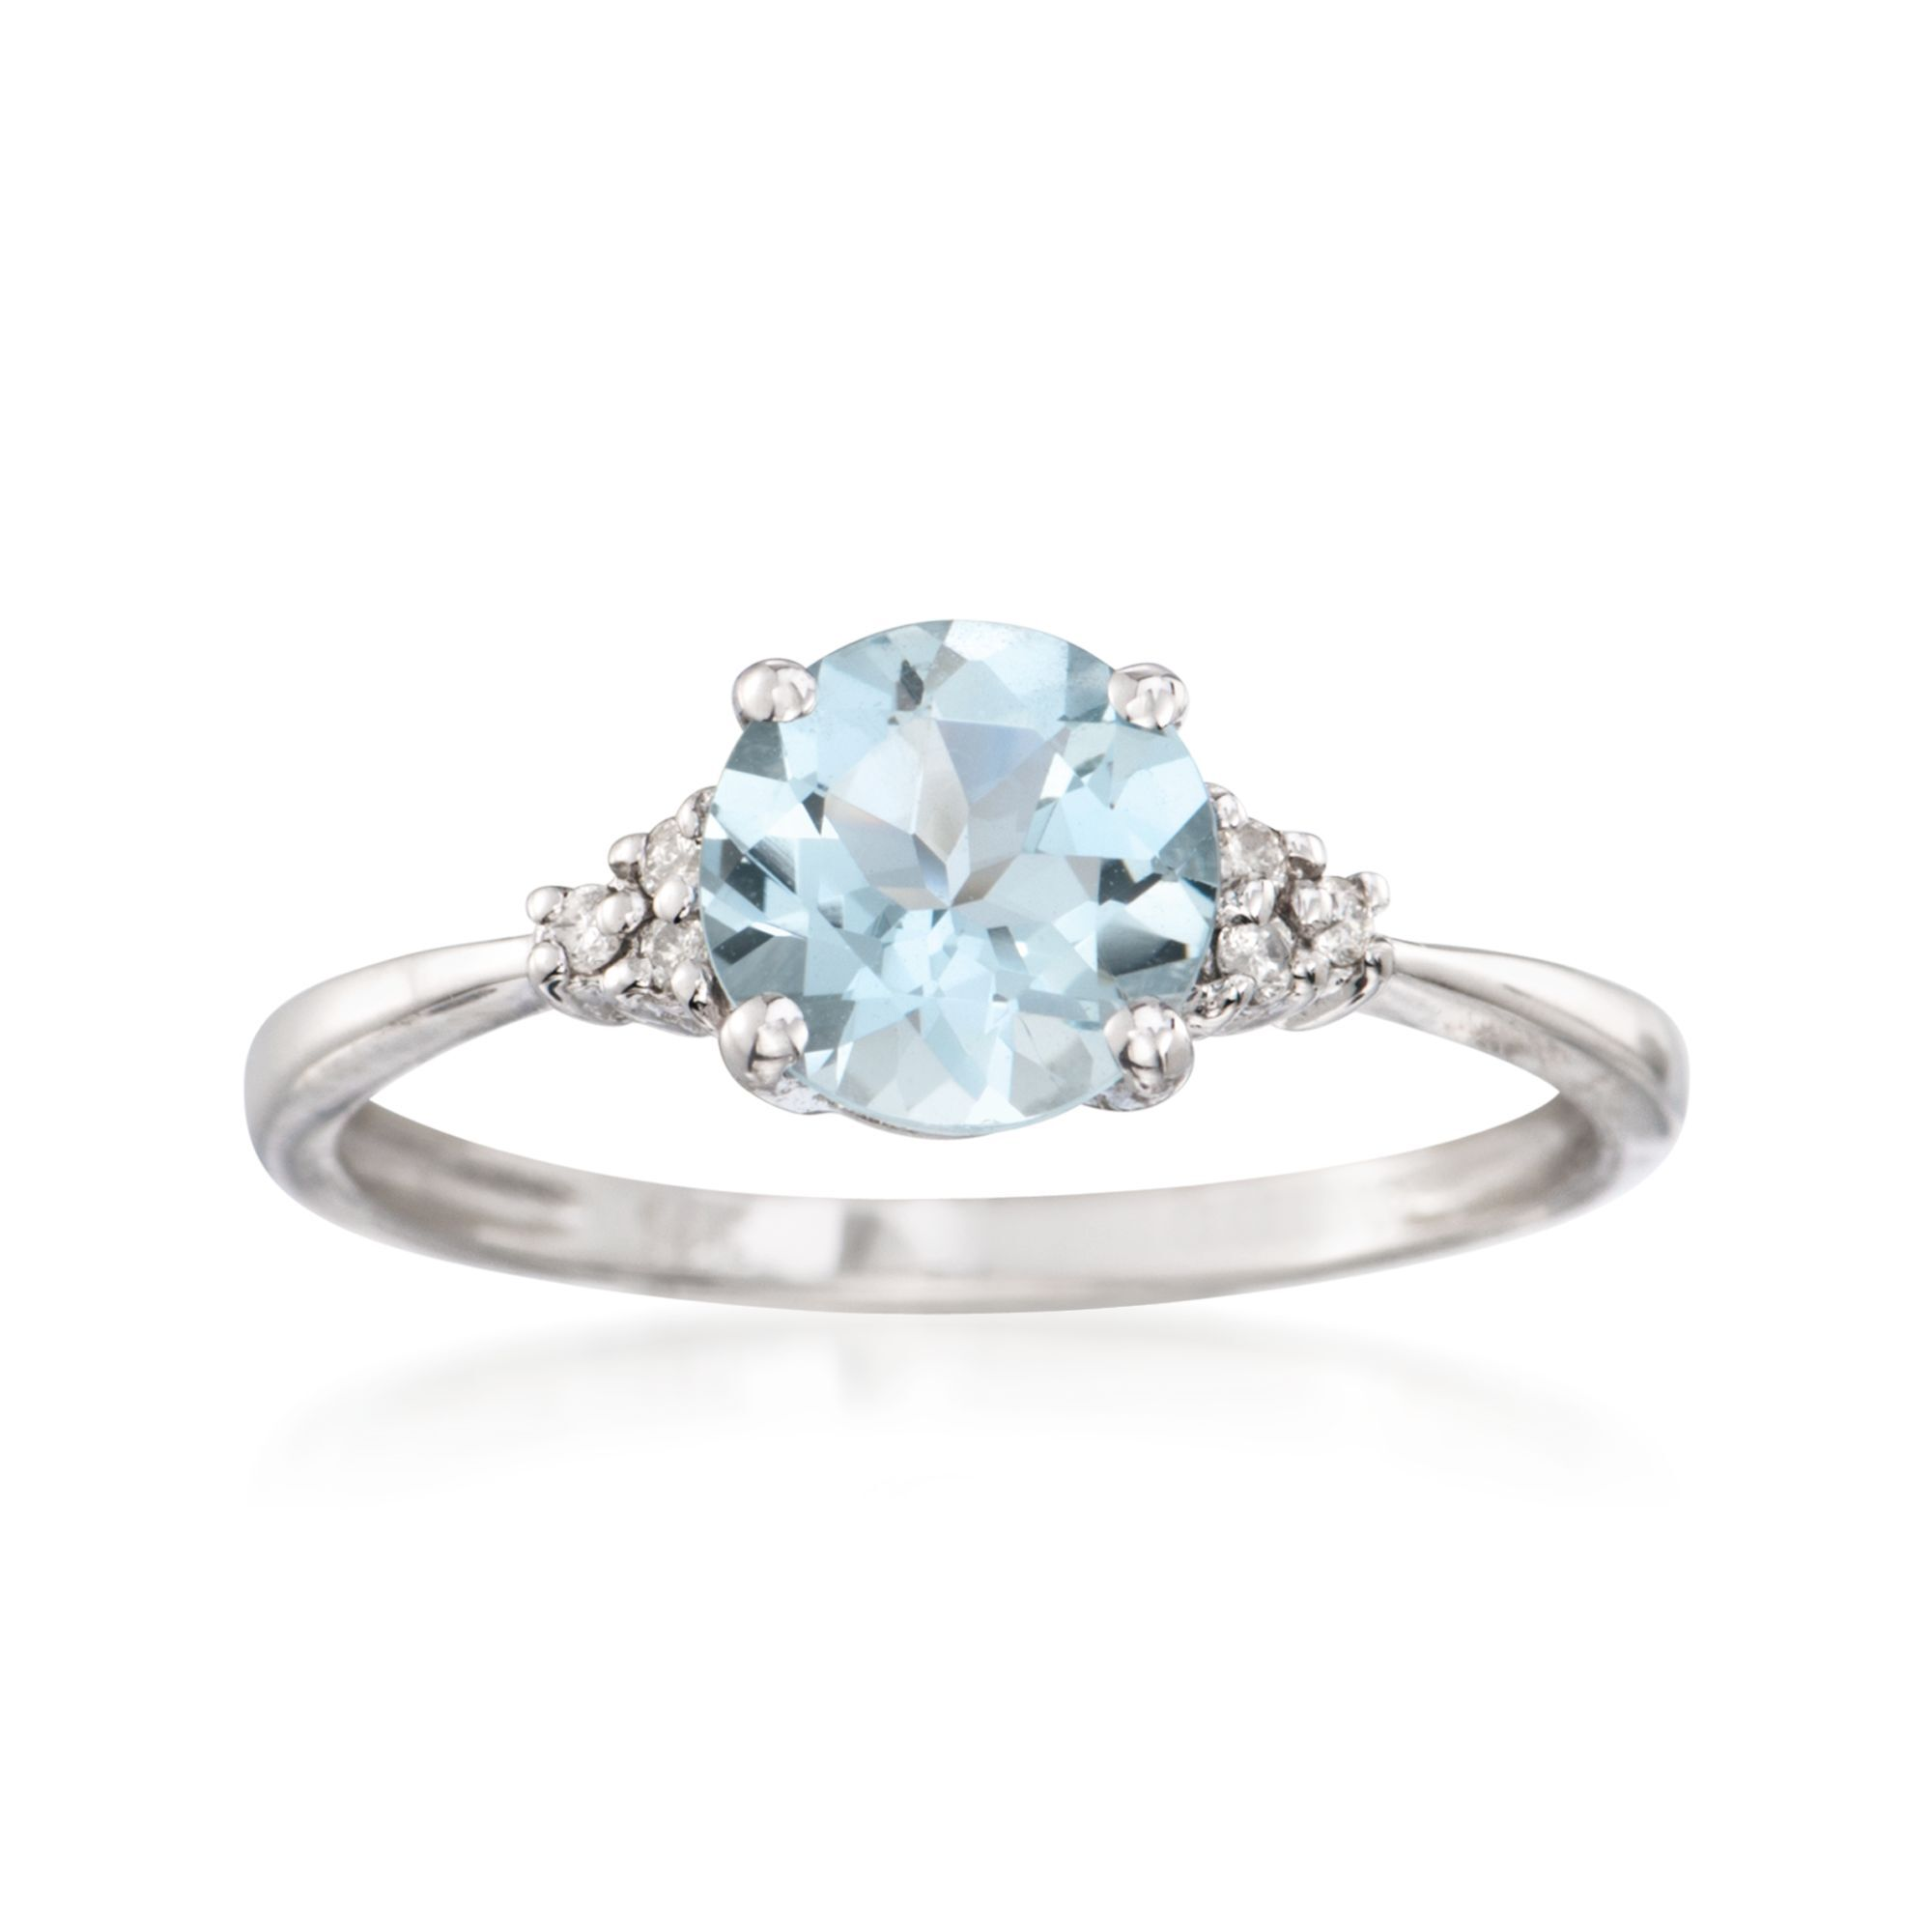 100 Carat Aquamarine Ring With Diamonds In 14kt White Gold